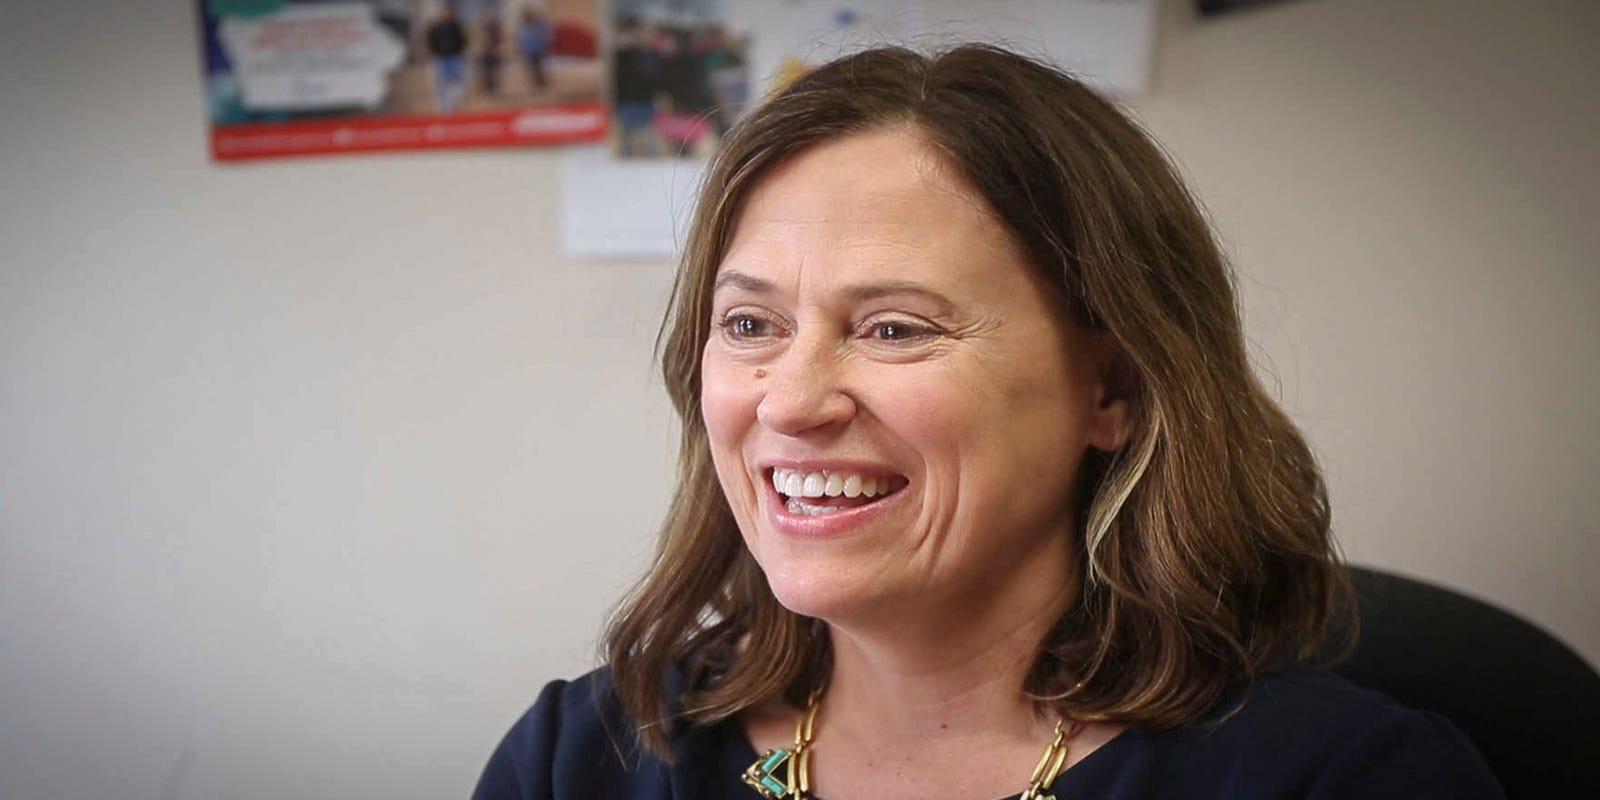 Democrat Theresa Greenfield raises $1.1M in race for US Senate seat